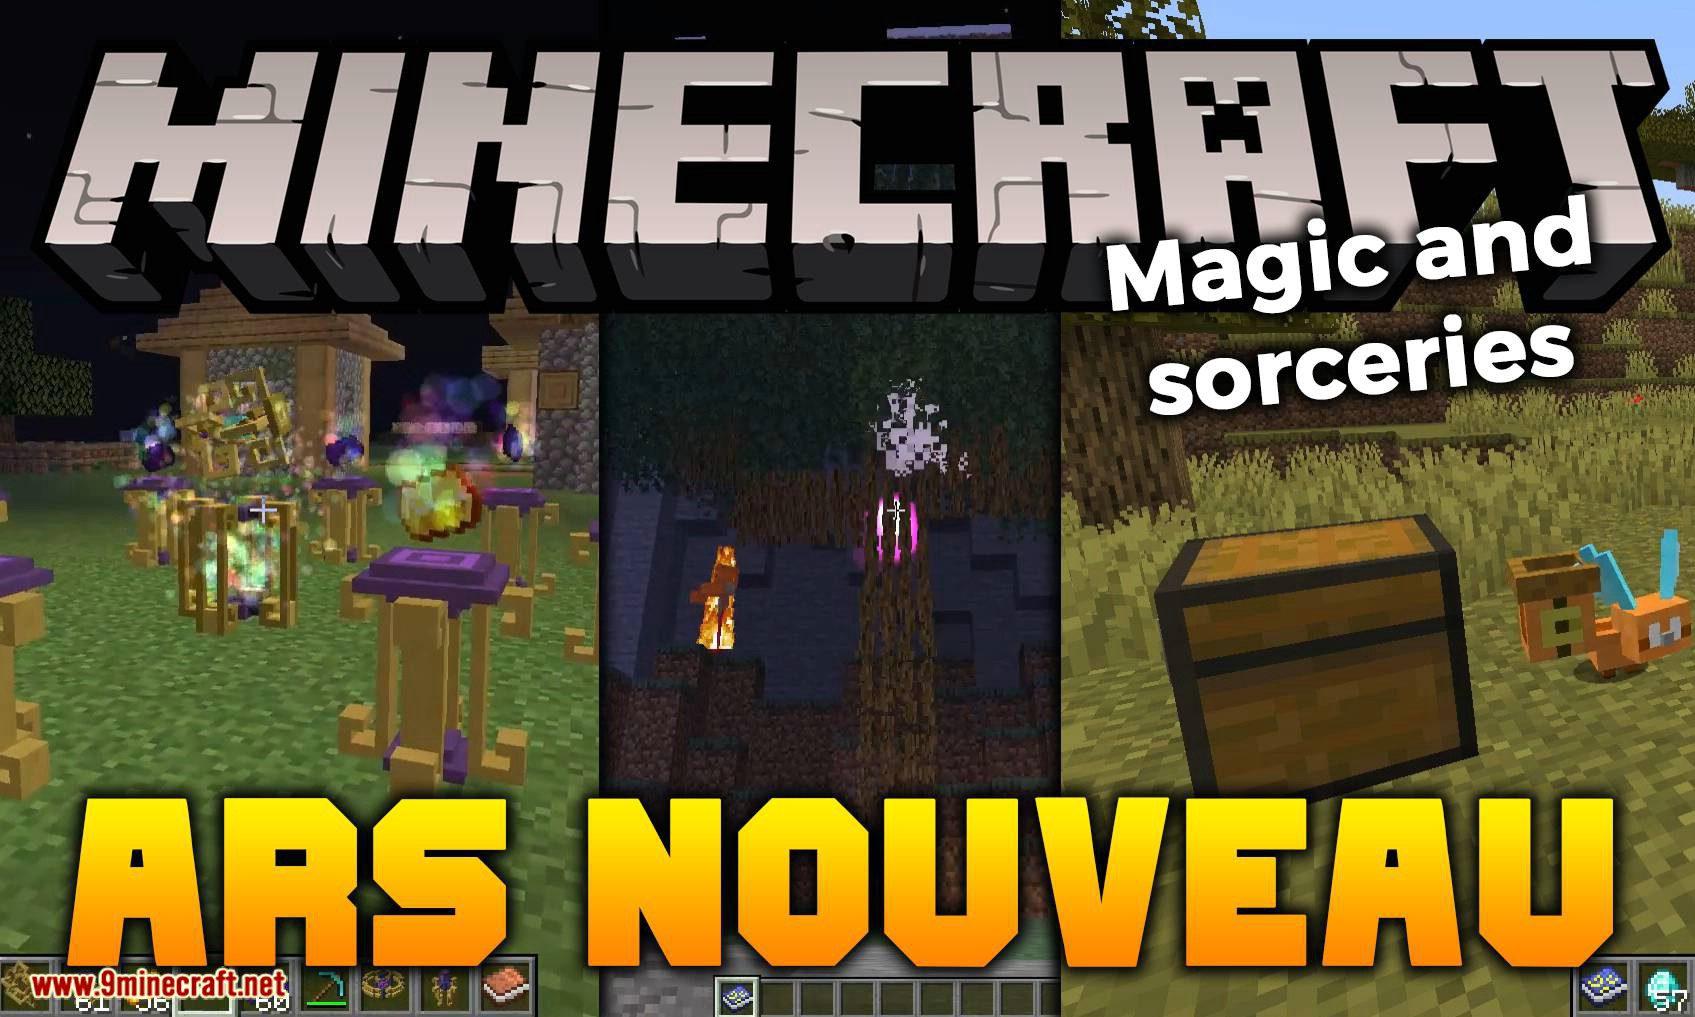 Ars Nouveau Mod 1.16.5/1.15.2 (Magic and Sorceries)